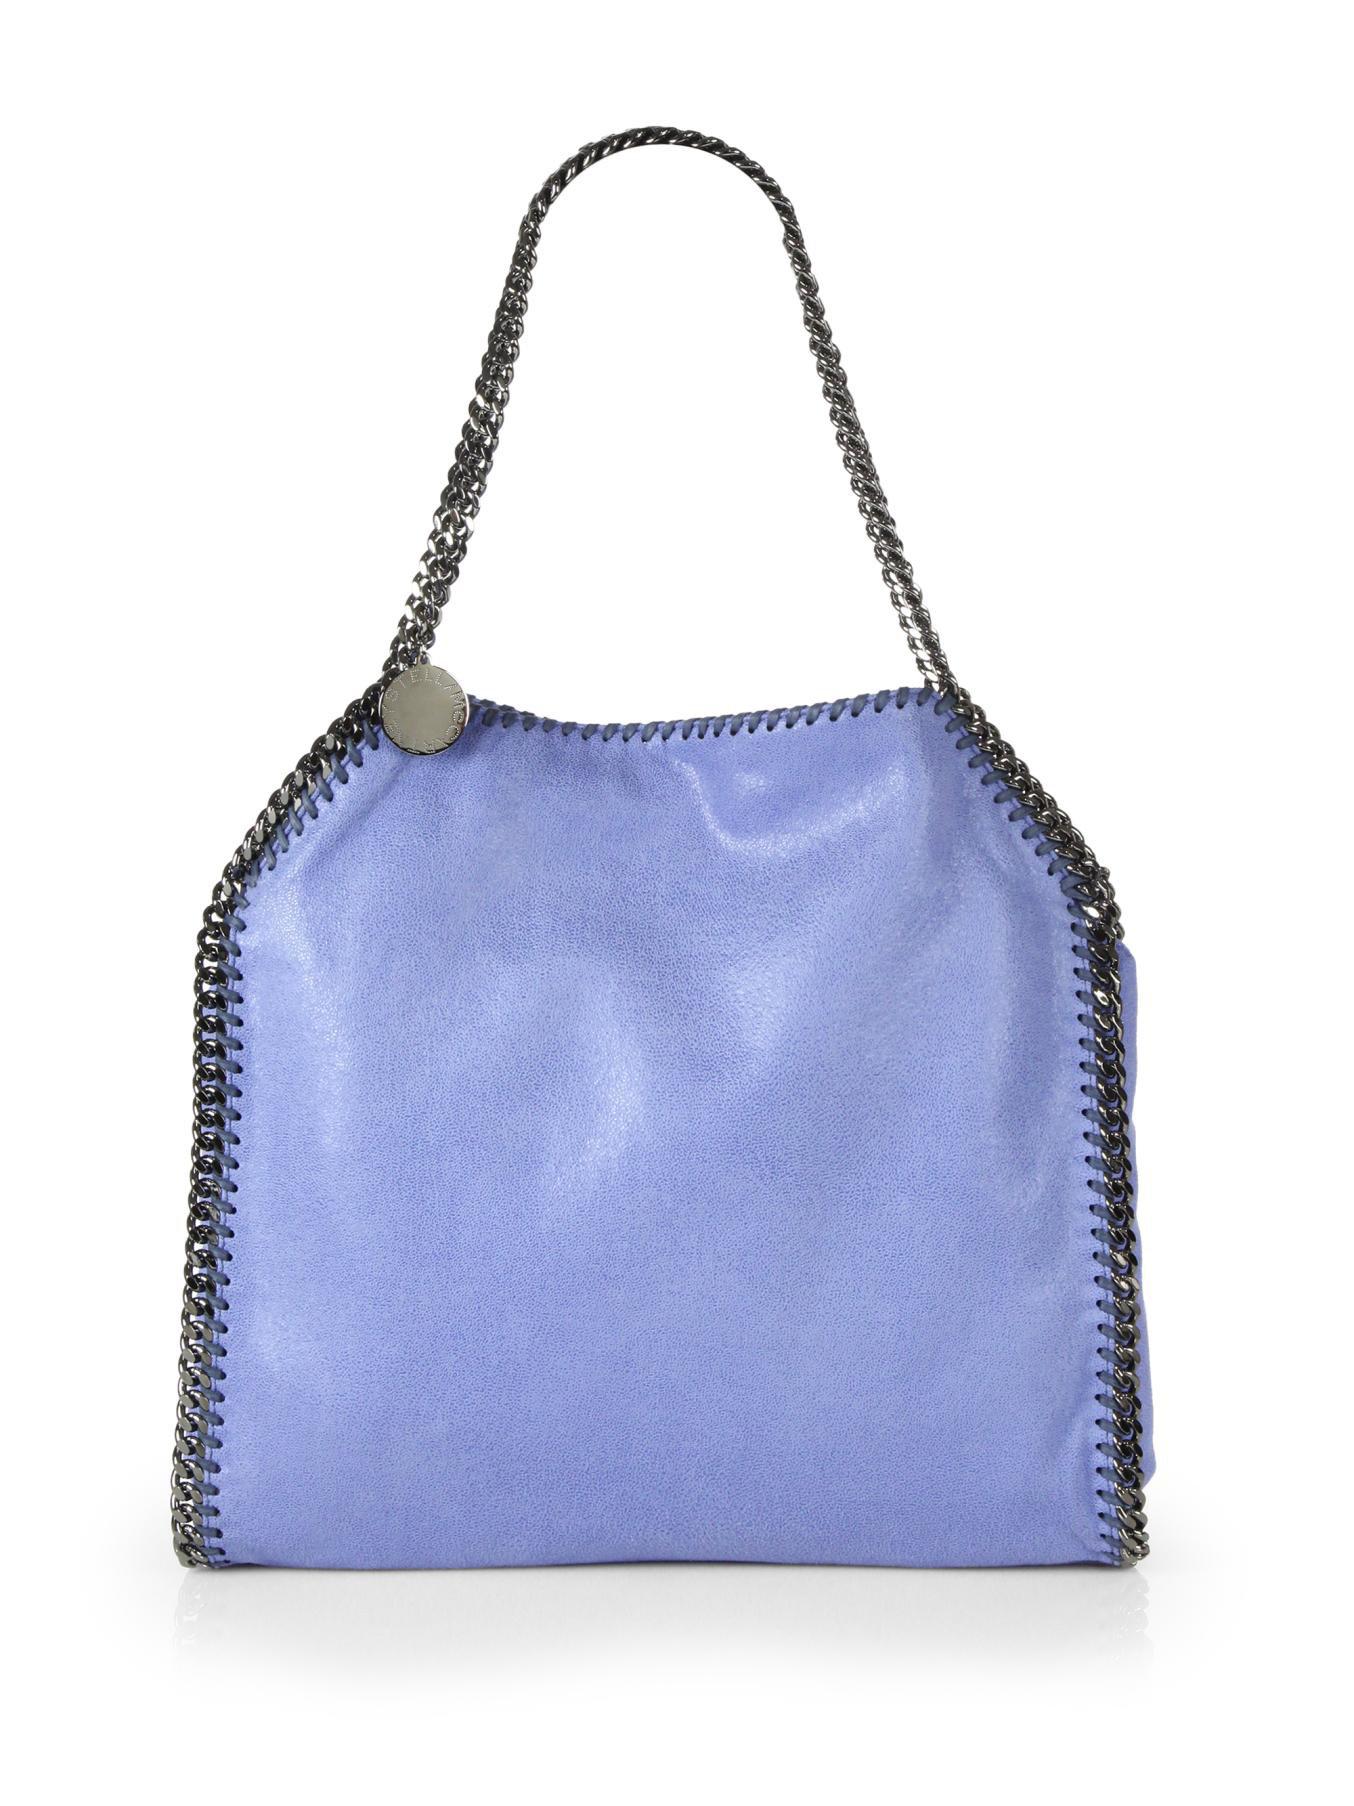 Stella mccartney Falabella Baby Bella Shoulder Bag in ...